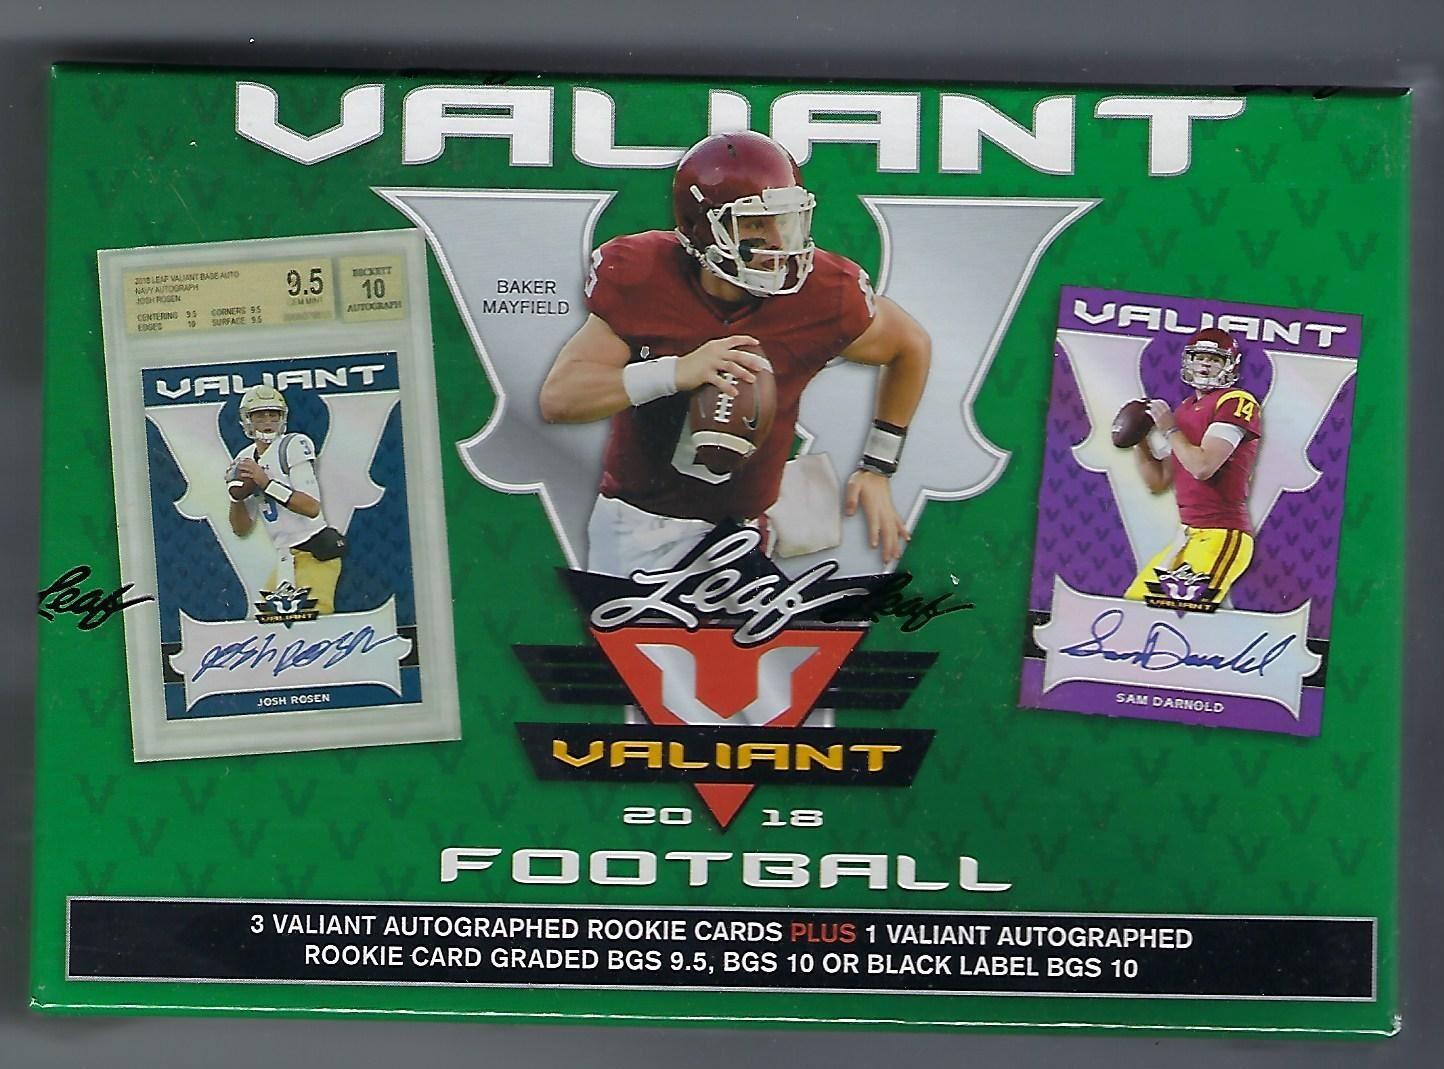 2018 Leaf Valiant Football Factory Sealed Hobby Box.